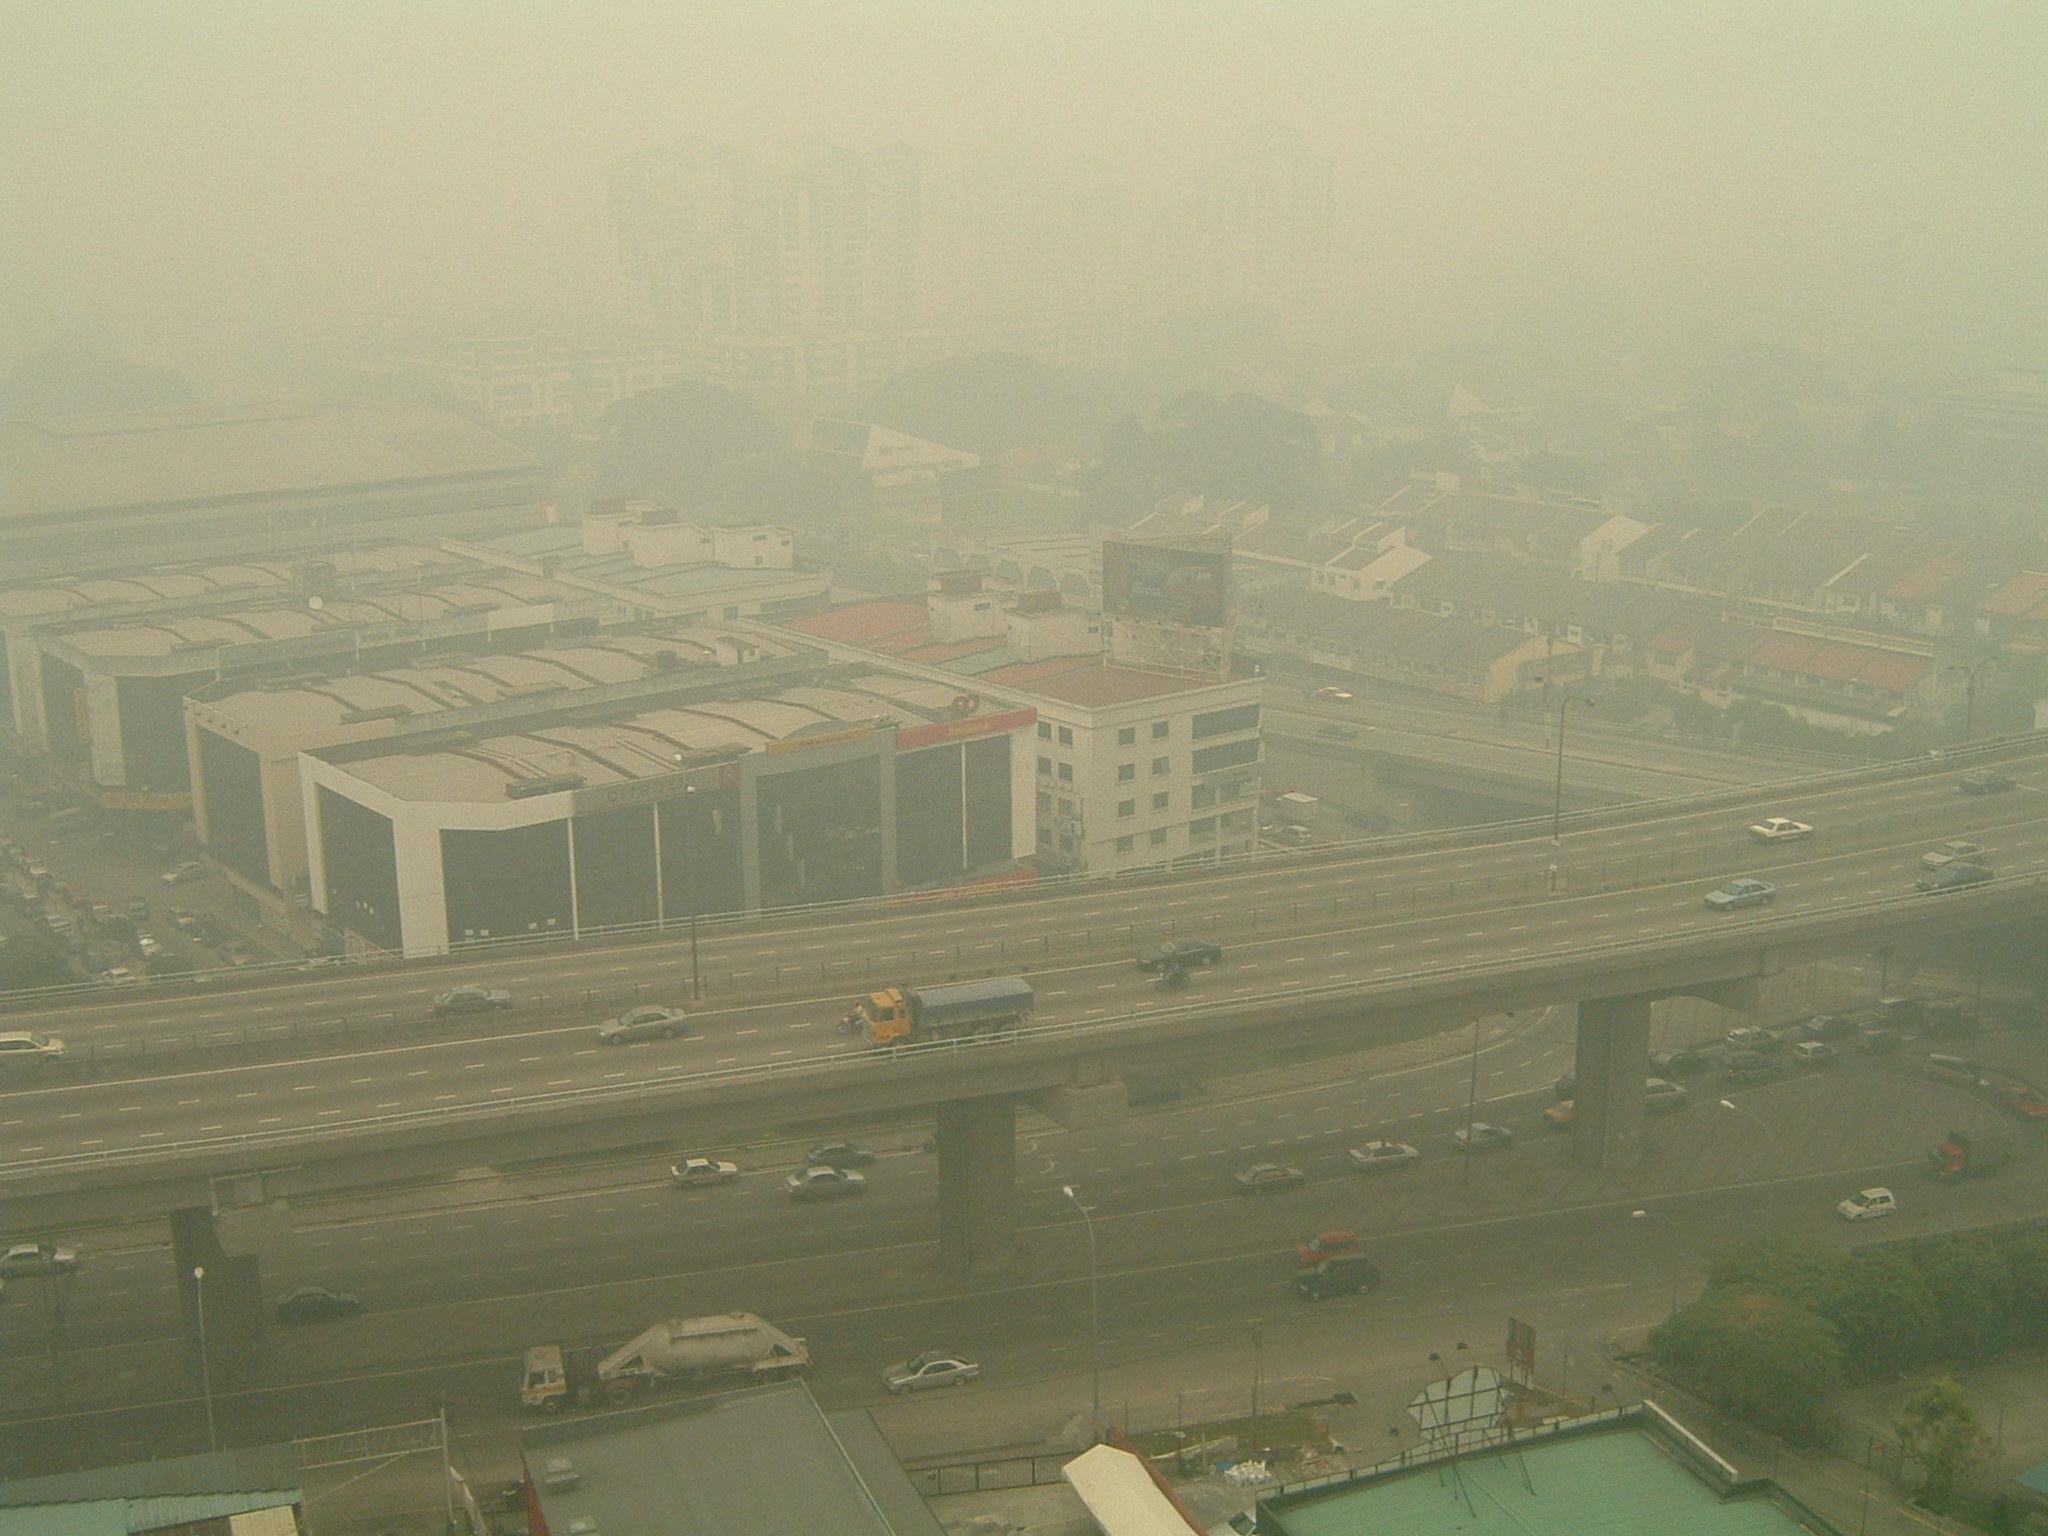 Haze over Kuala Lumpur, Malaysia